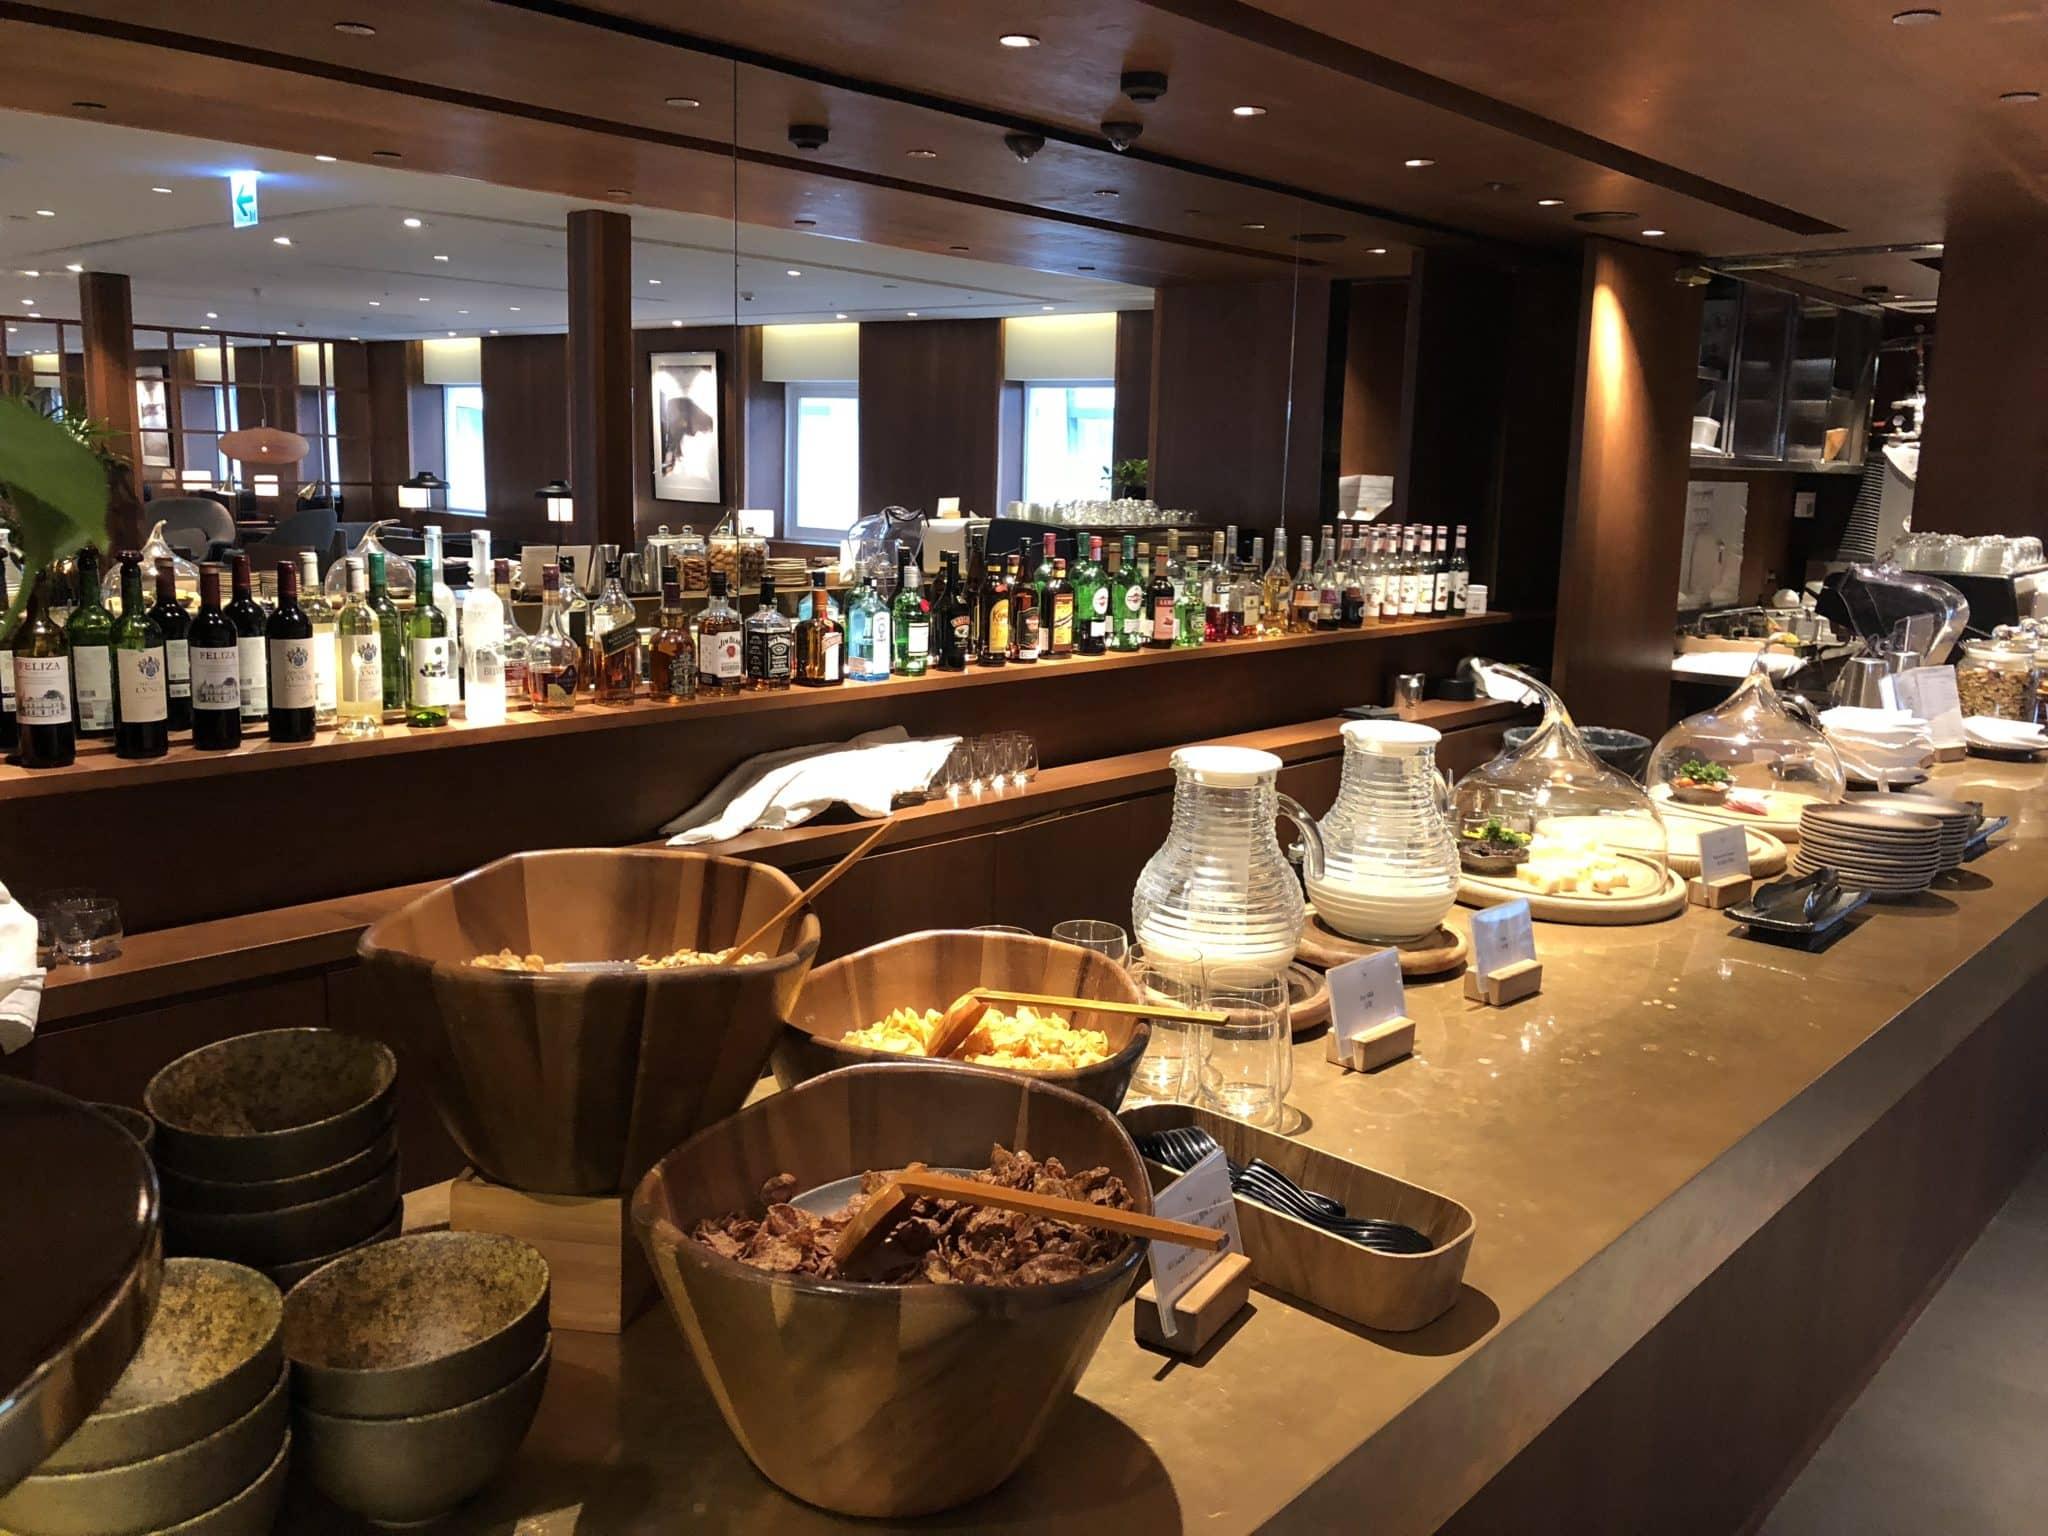 Cathay Pacific Business Class Lounge Taiwan-Taoyuan Fruehstueck an der Bar